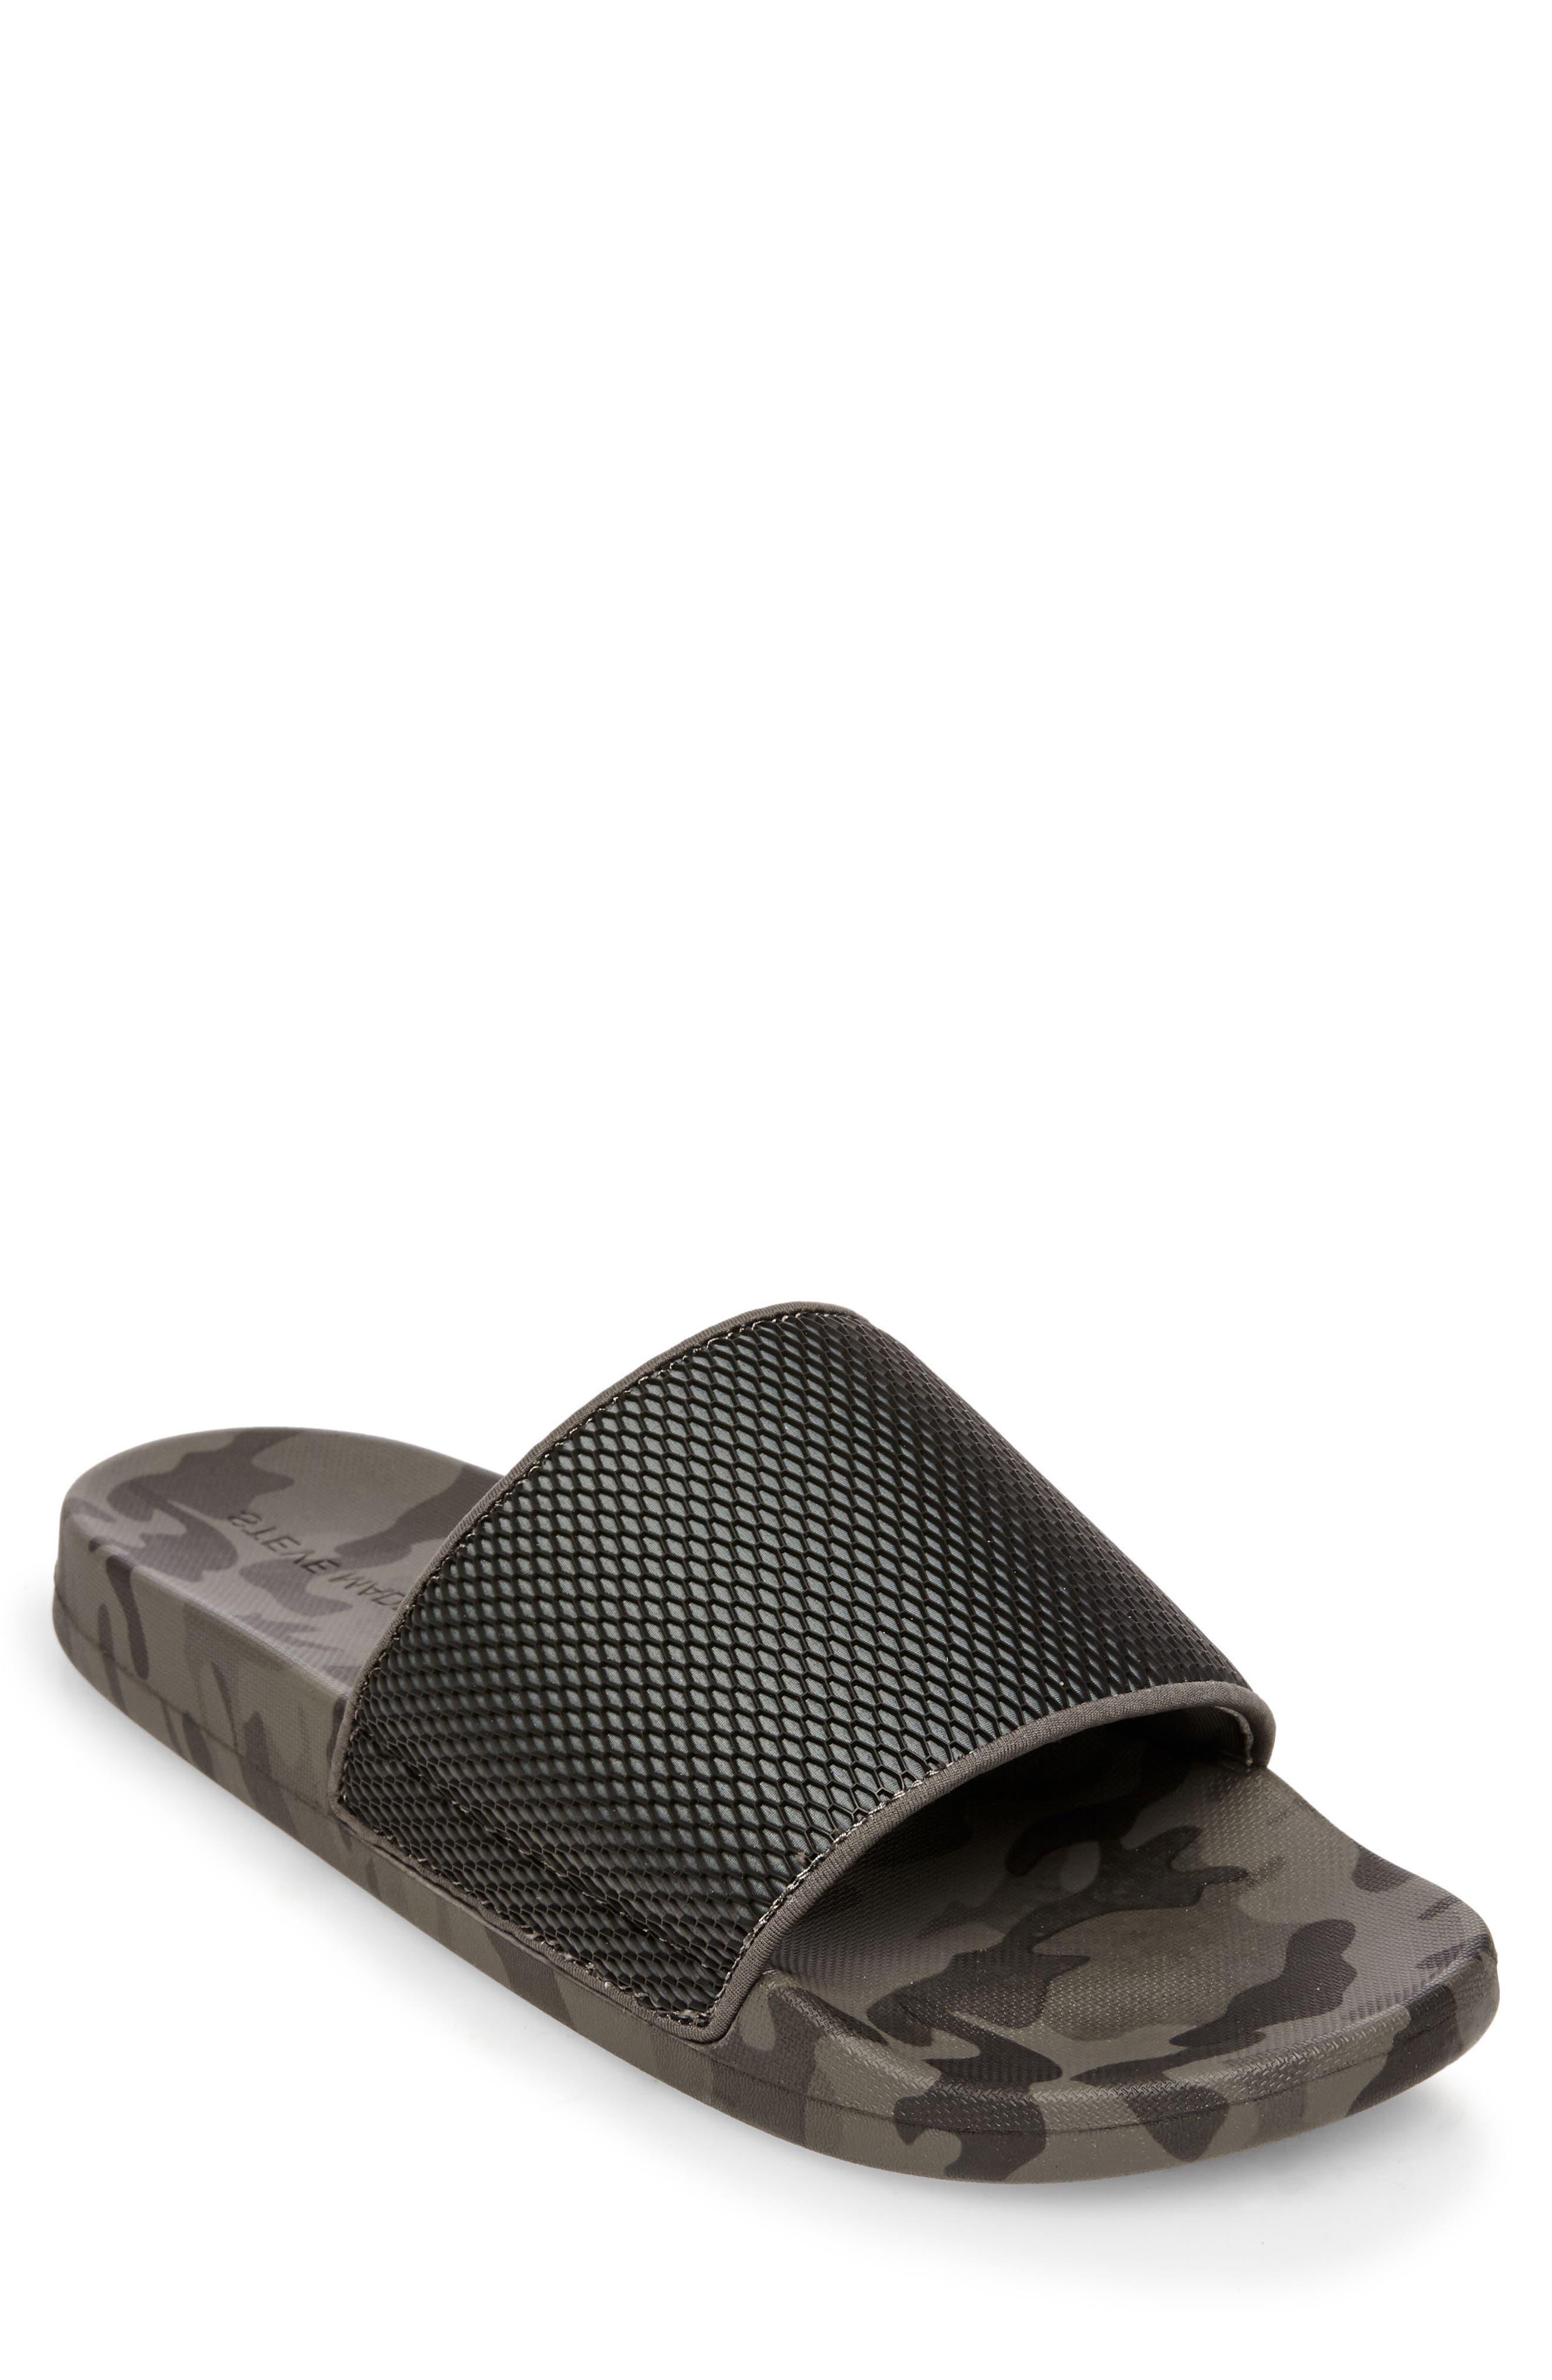 Seabees Textured Slide Sandal,                         Main,                         color, Grey Camo